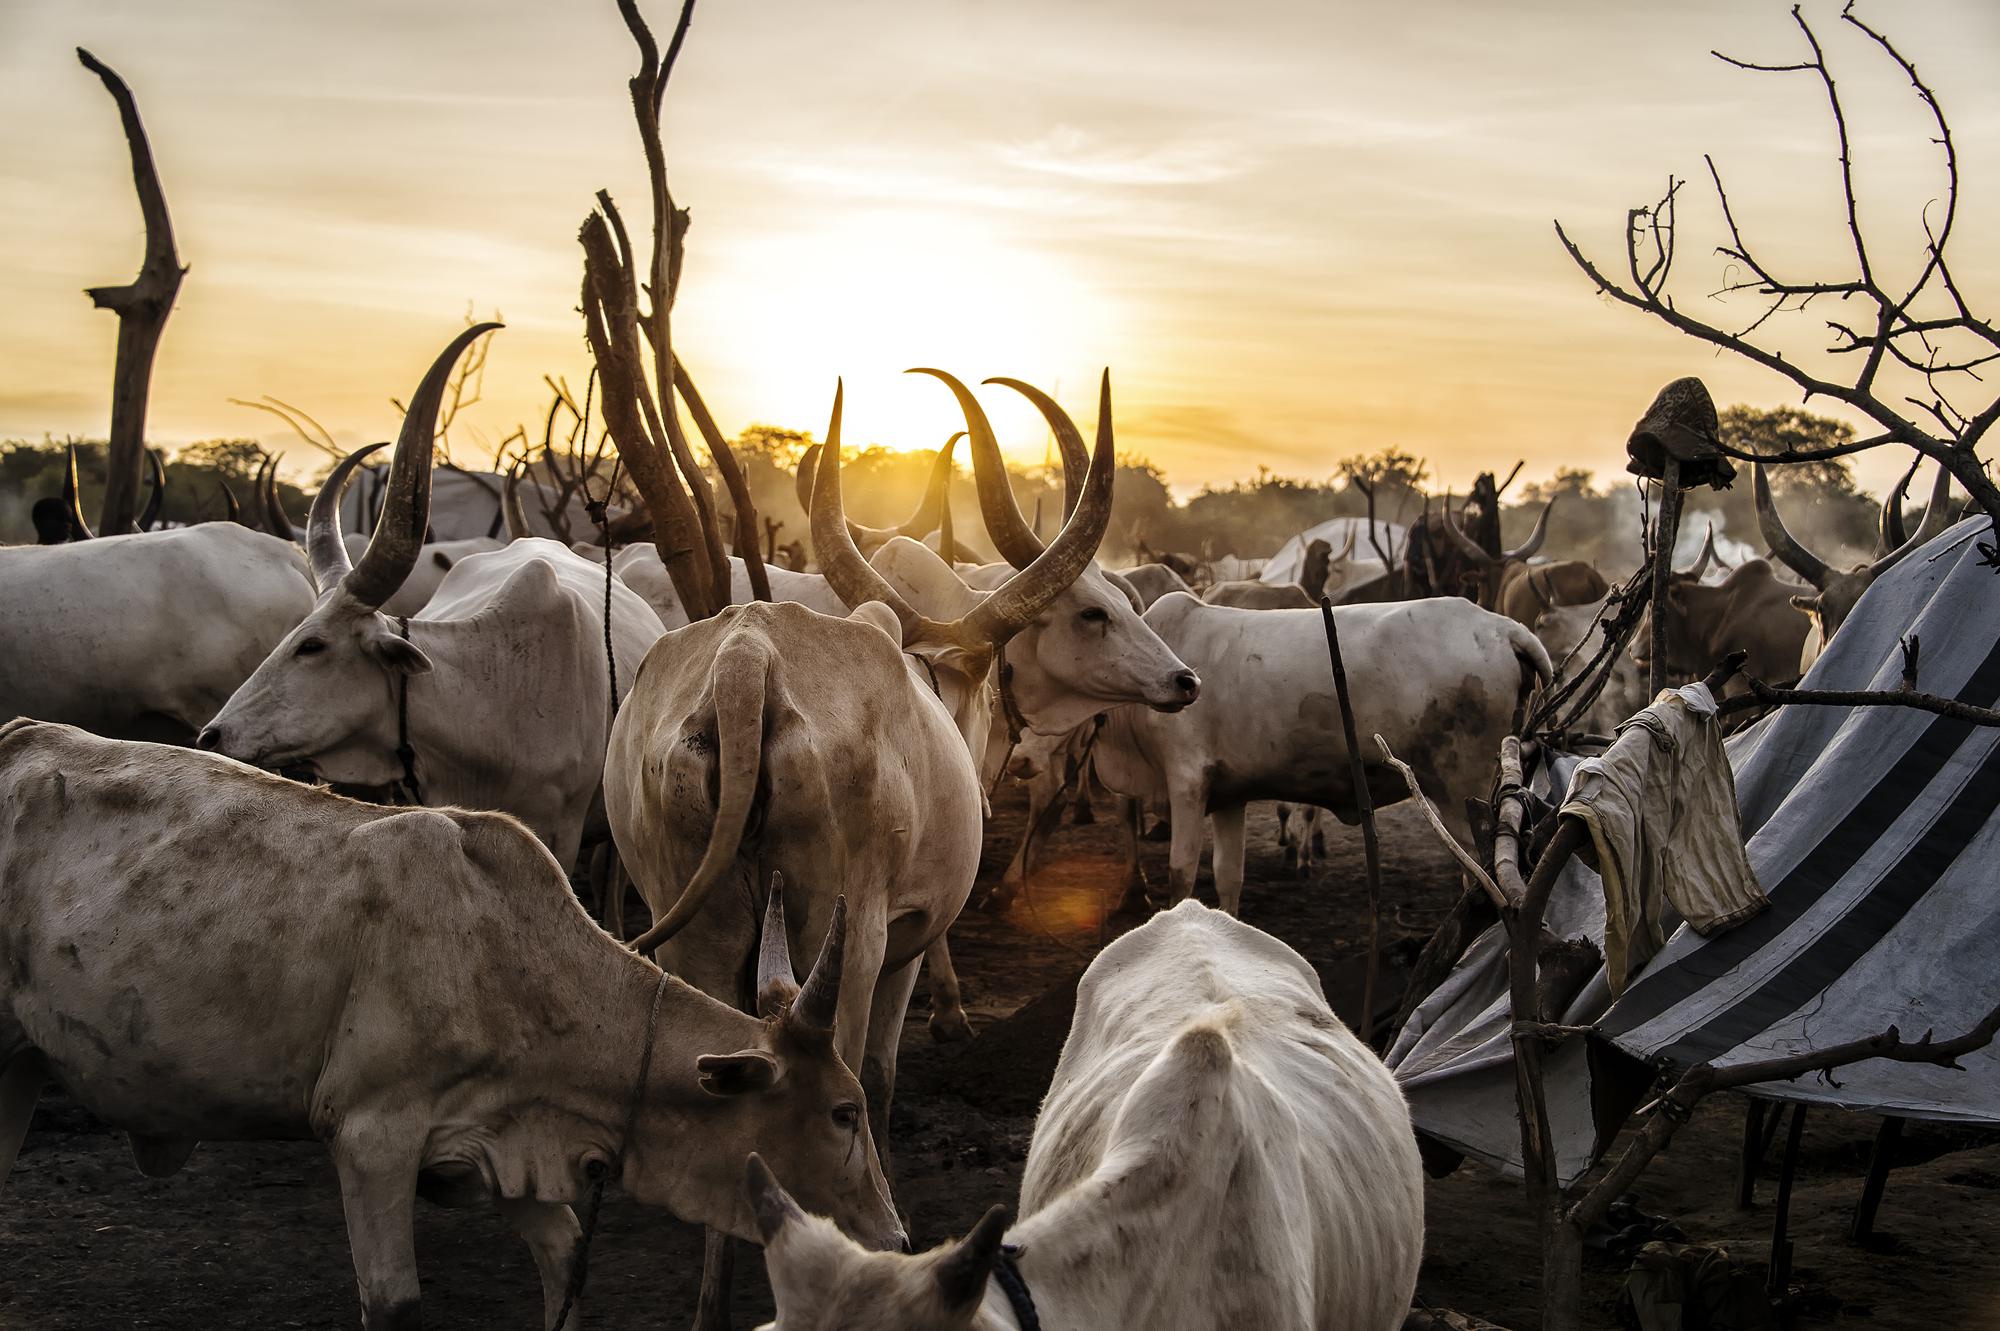 Cattle Camp. Bor, South Sudan